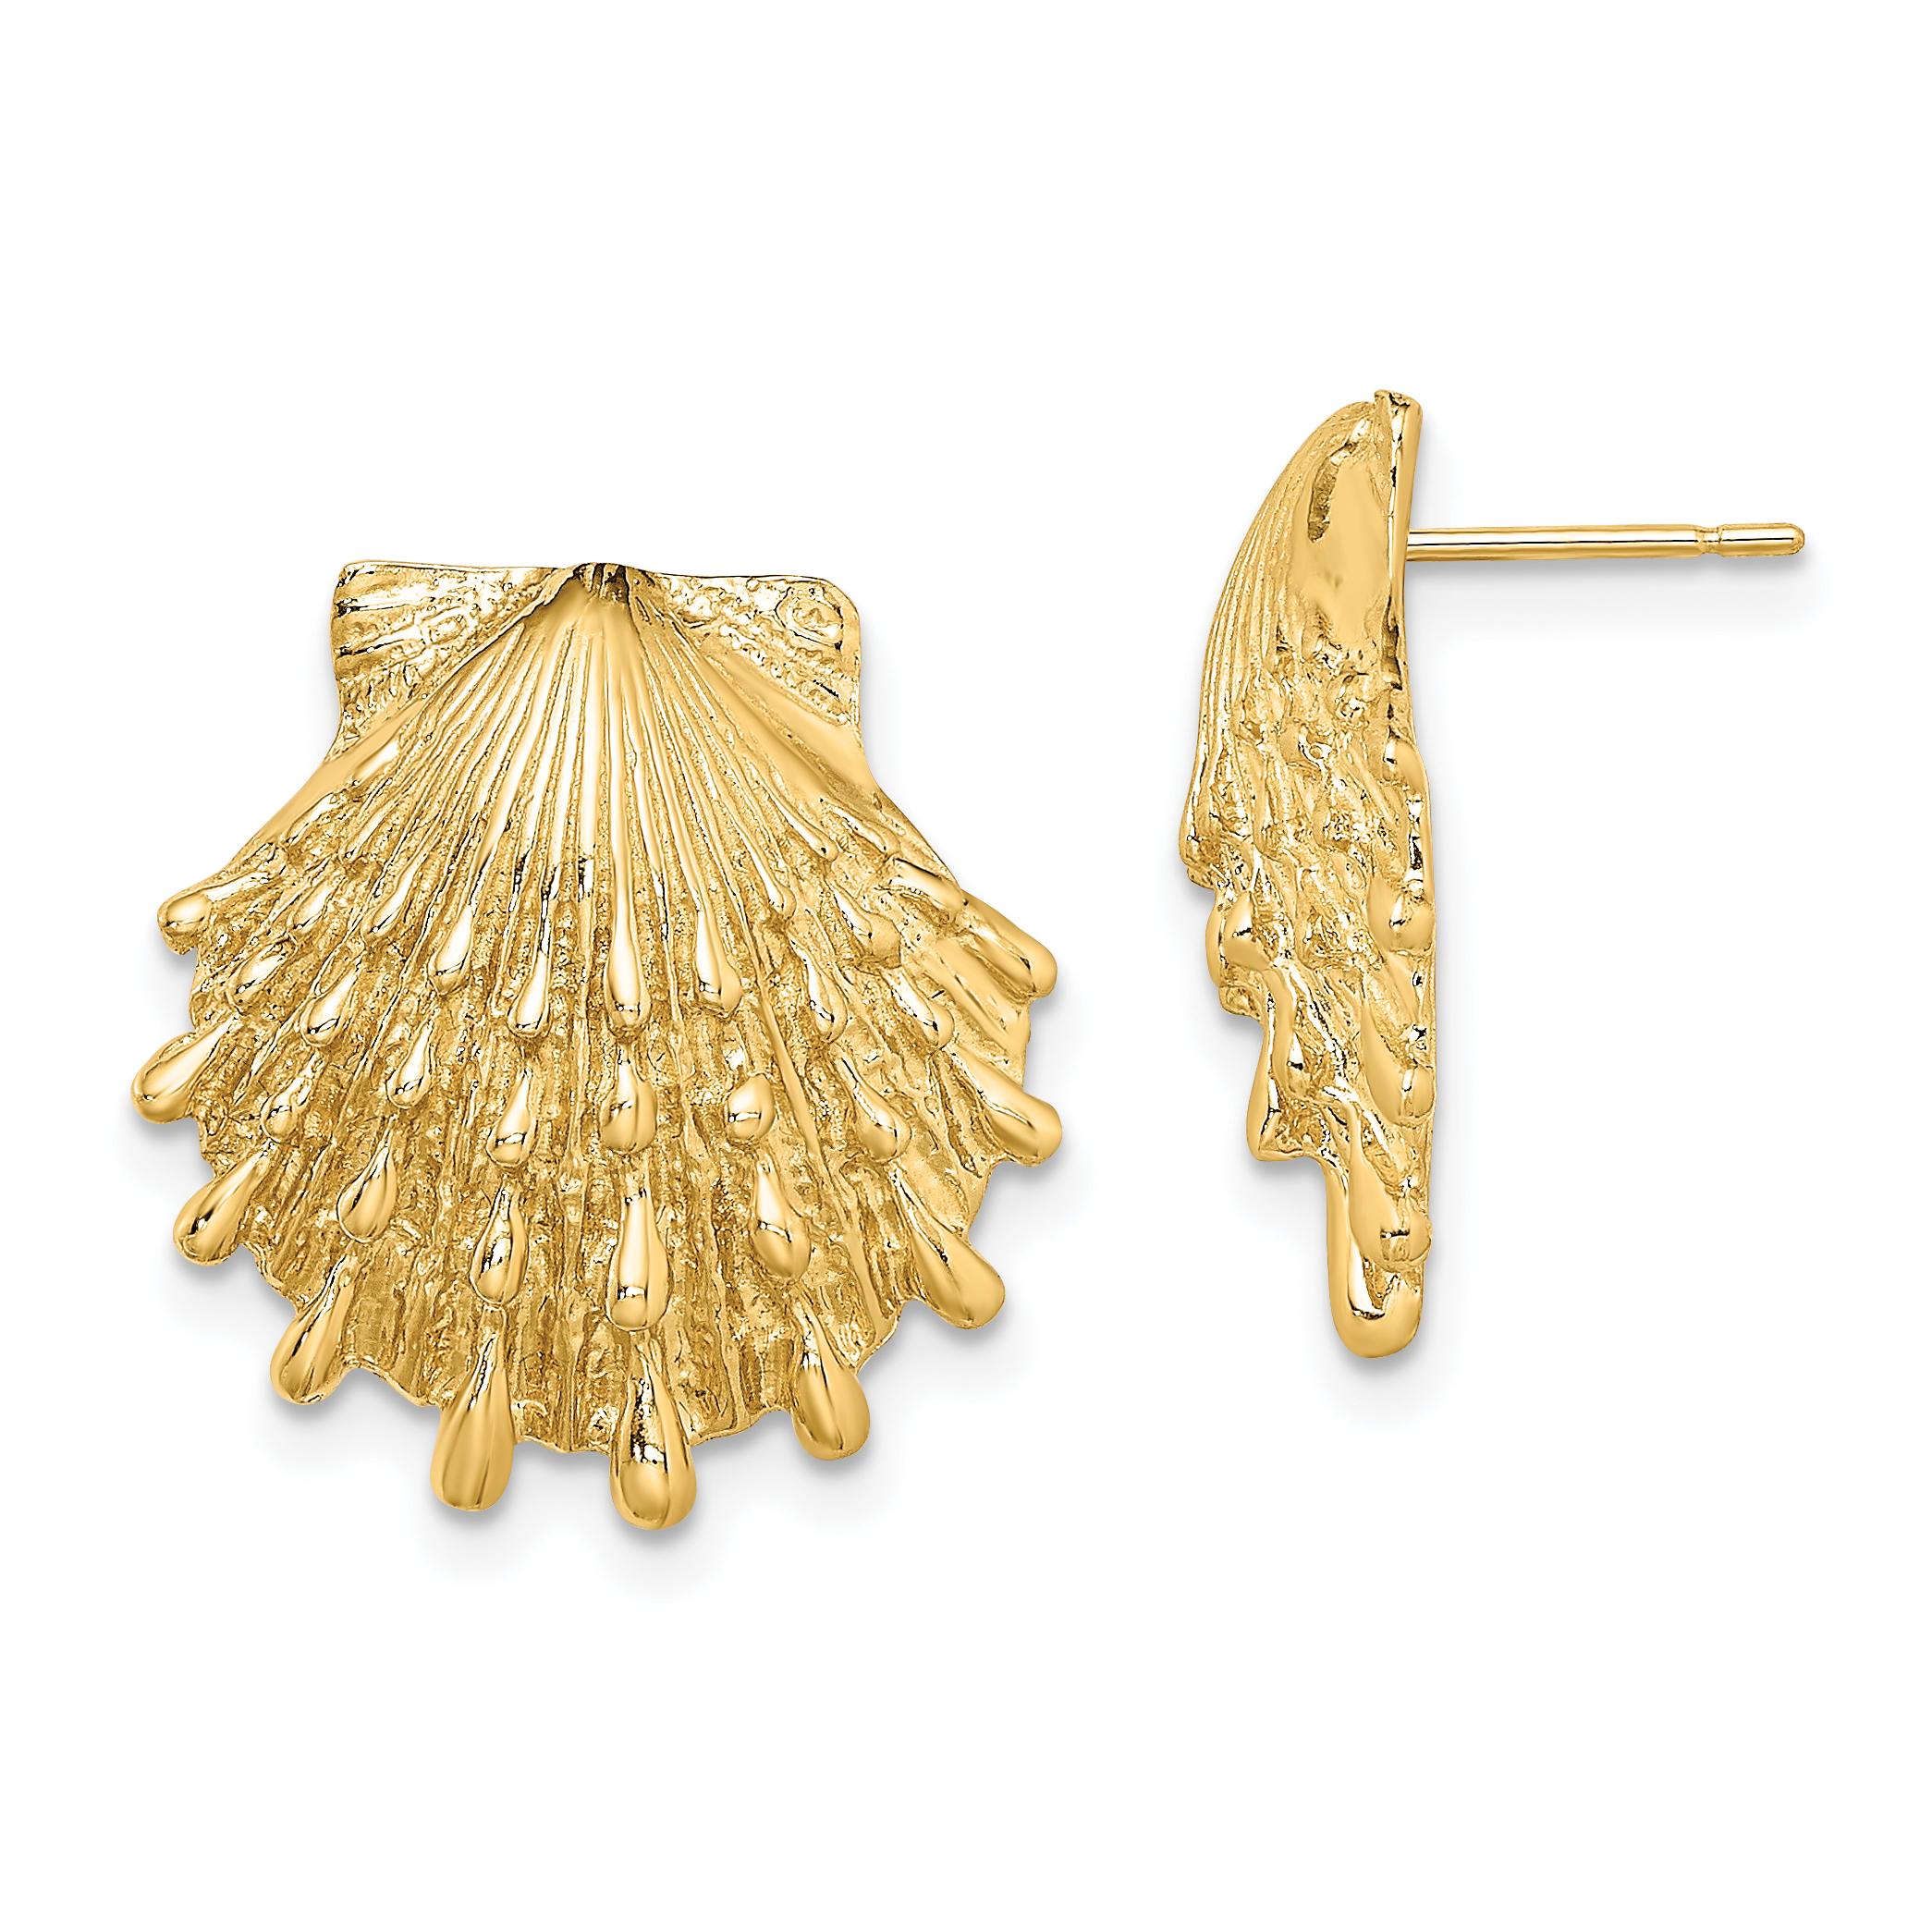 Lex /& Lu 14k Yellow Gold Sand Dollar Post Earrings